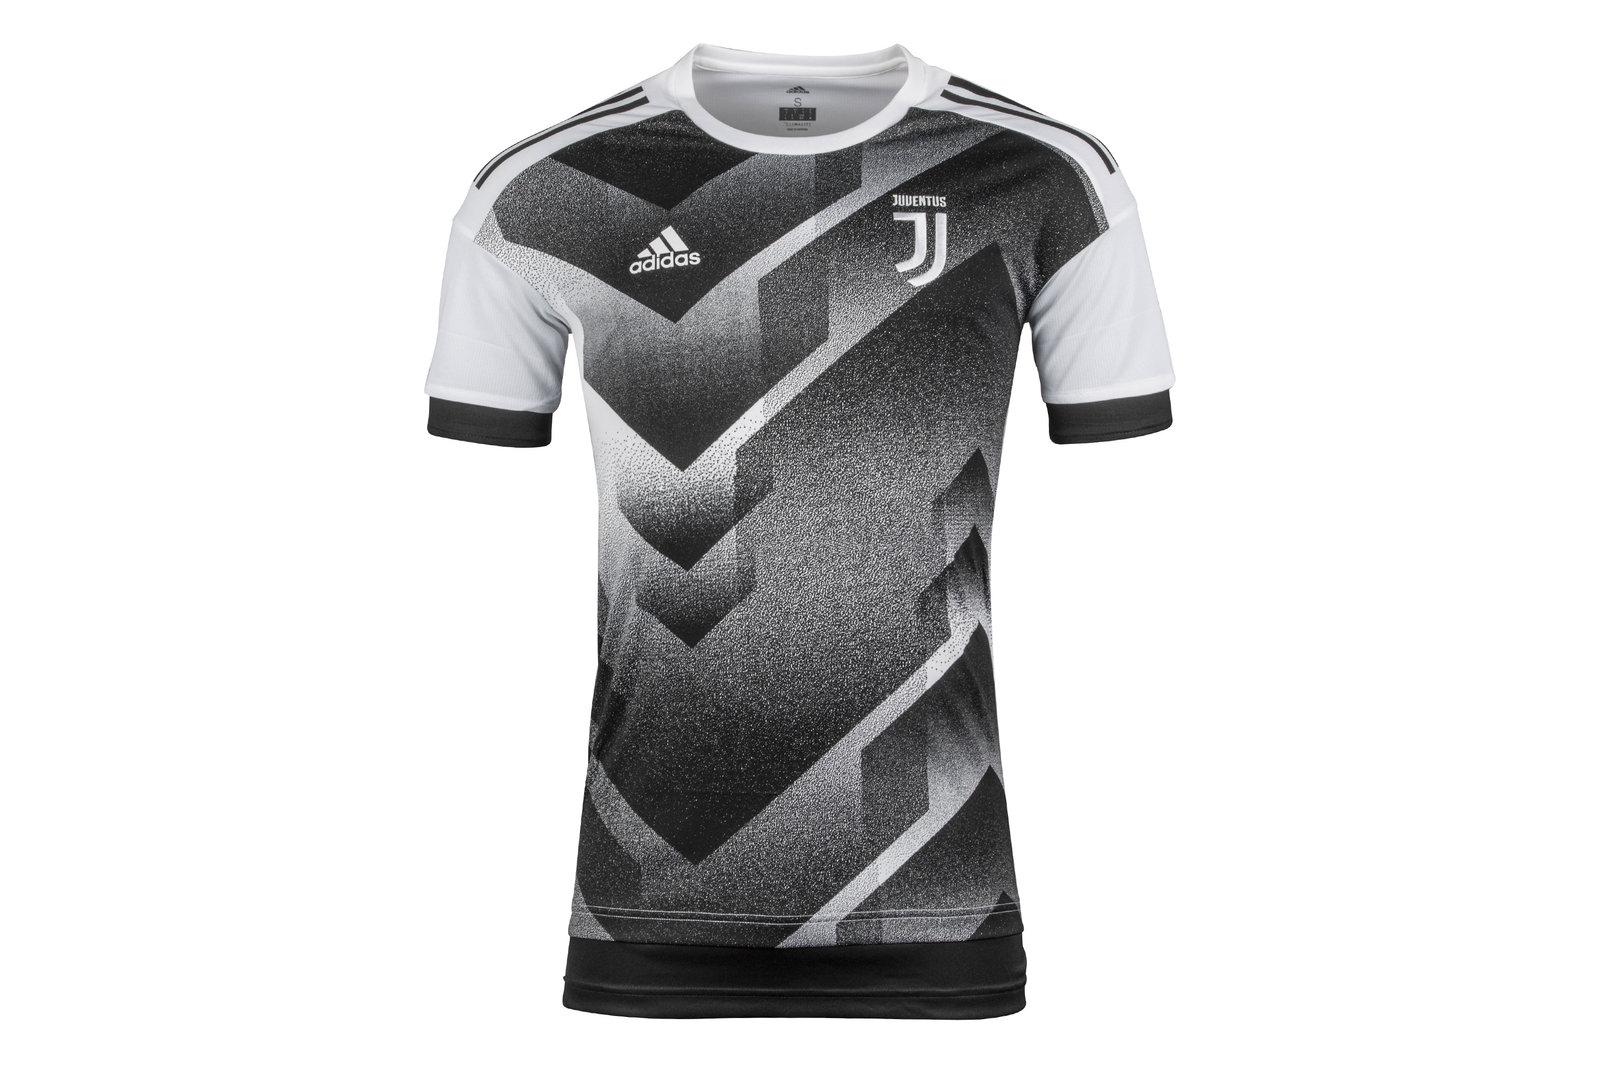 bd857f4303b adidas Mens Juventus 17/18 Pre-Match Football Training Shirt Top Sports